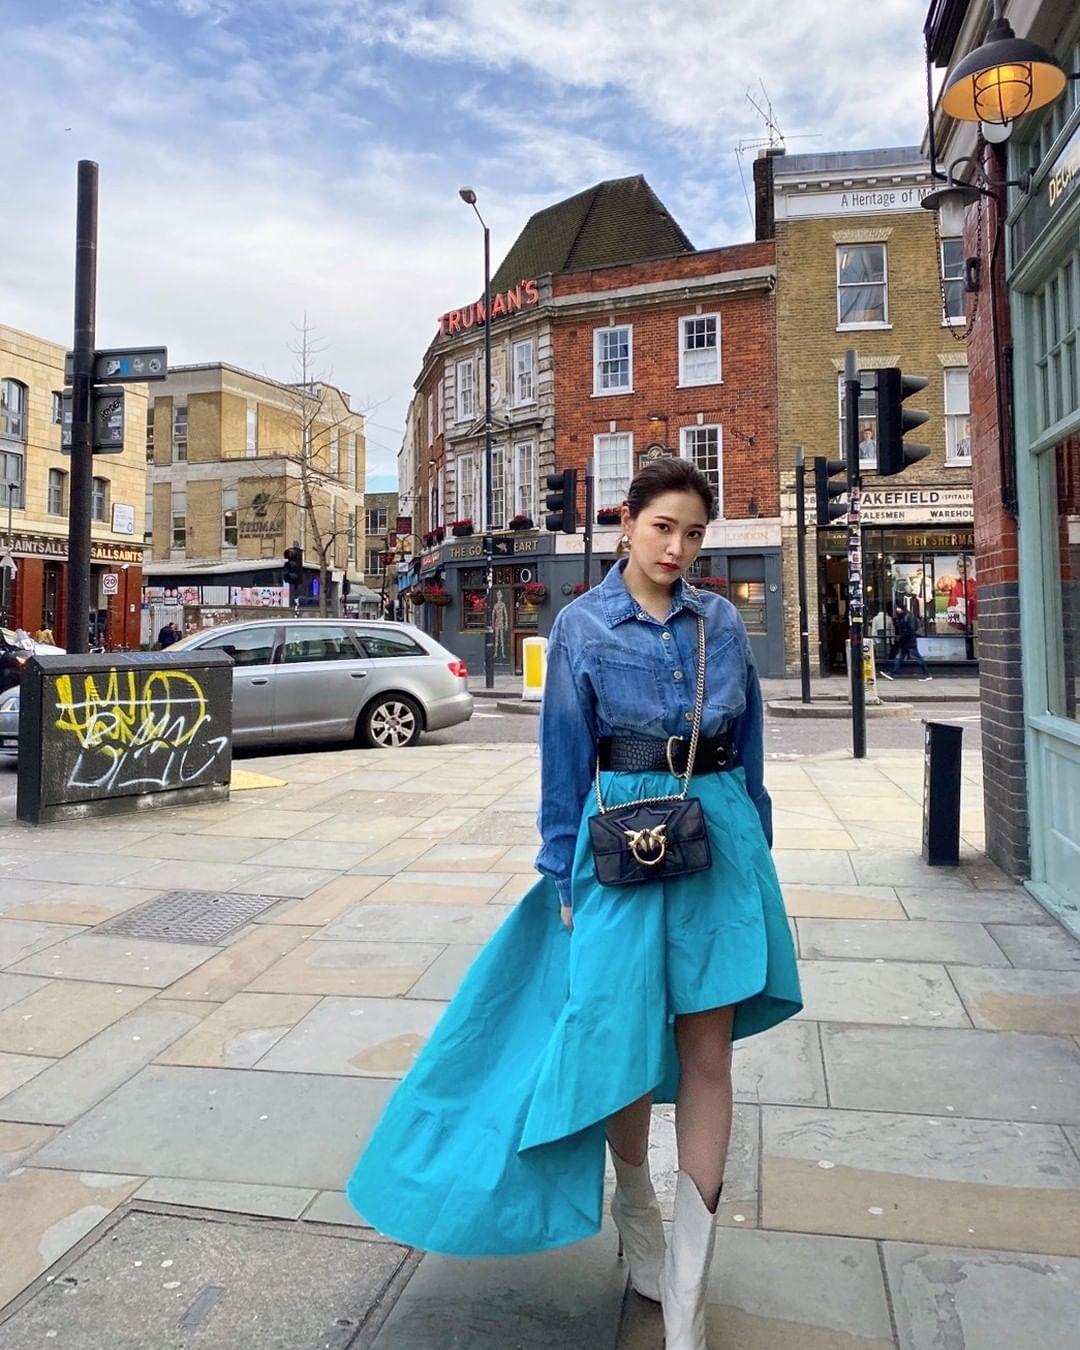 Red Velvet的Yeri金艺琳正生活在她接管欧洲的梦想中